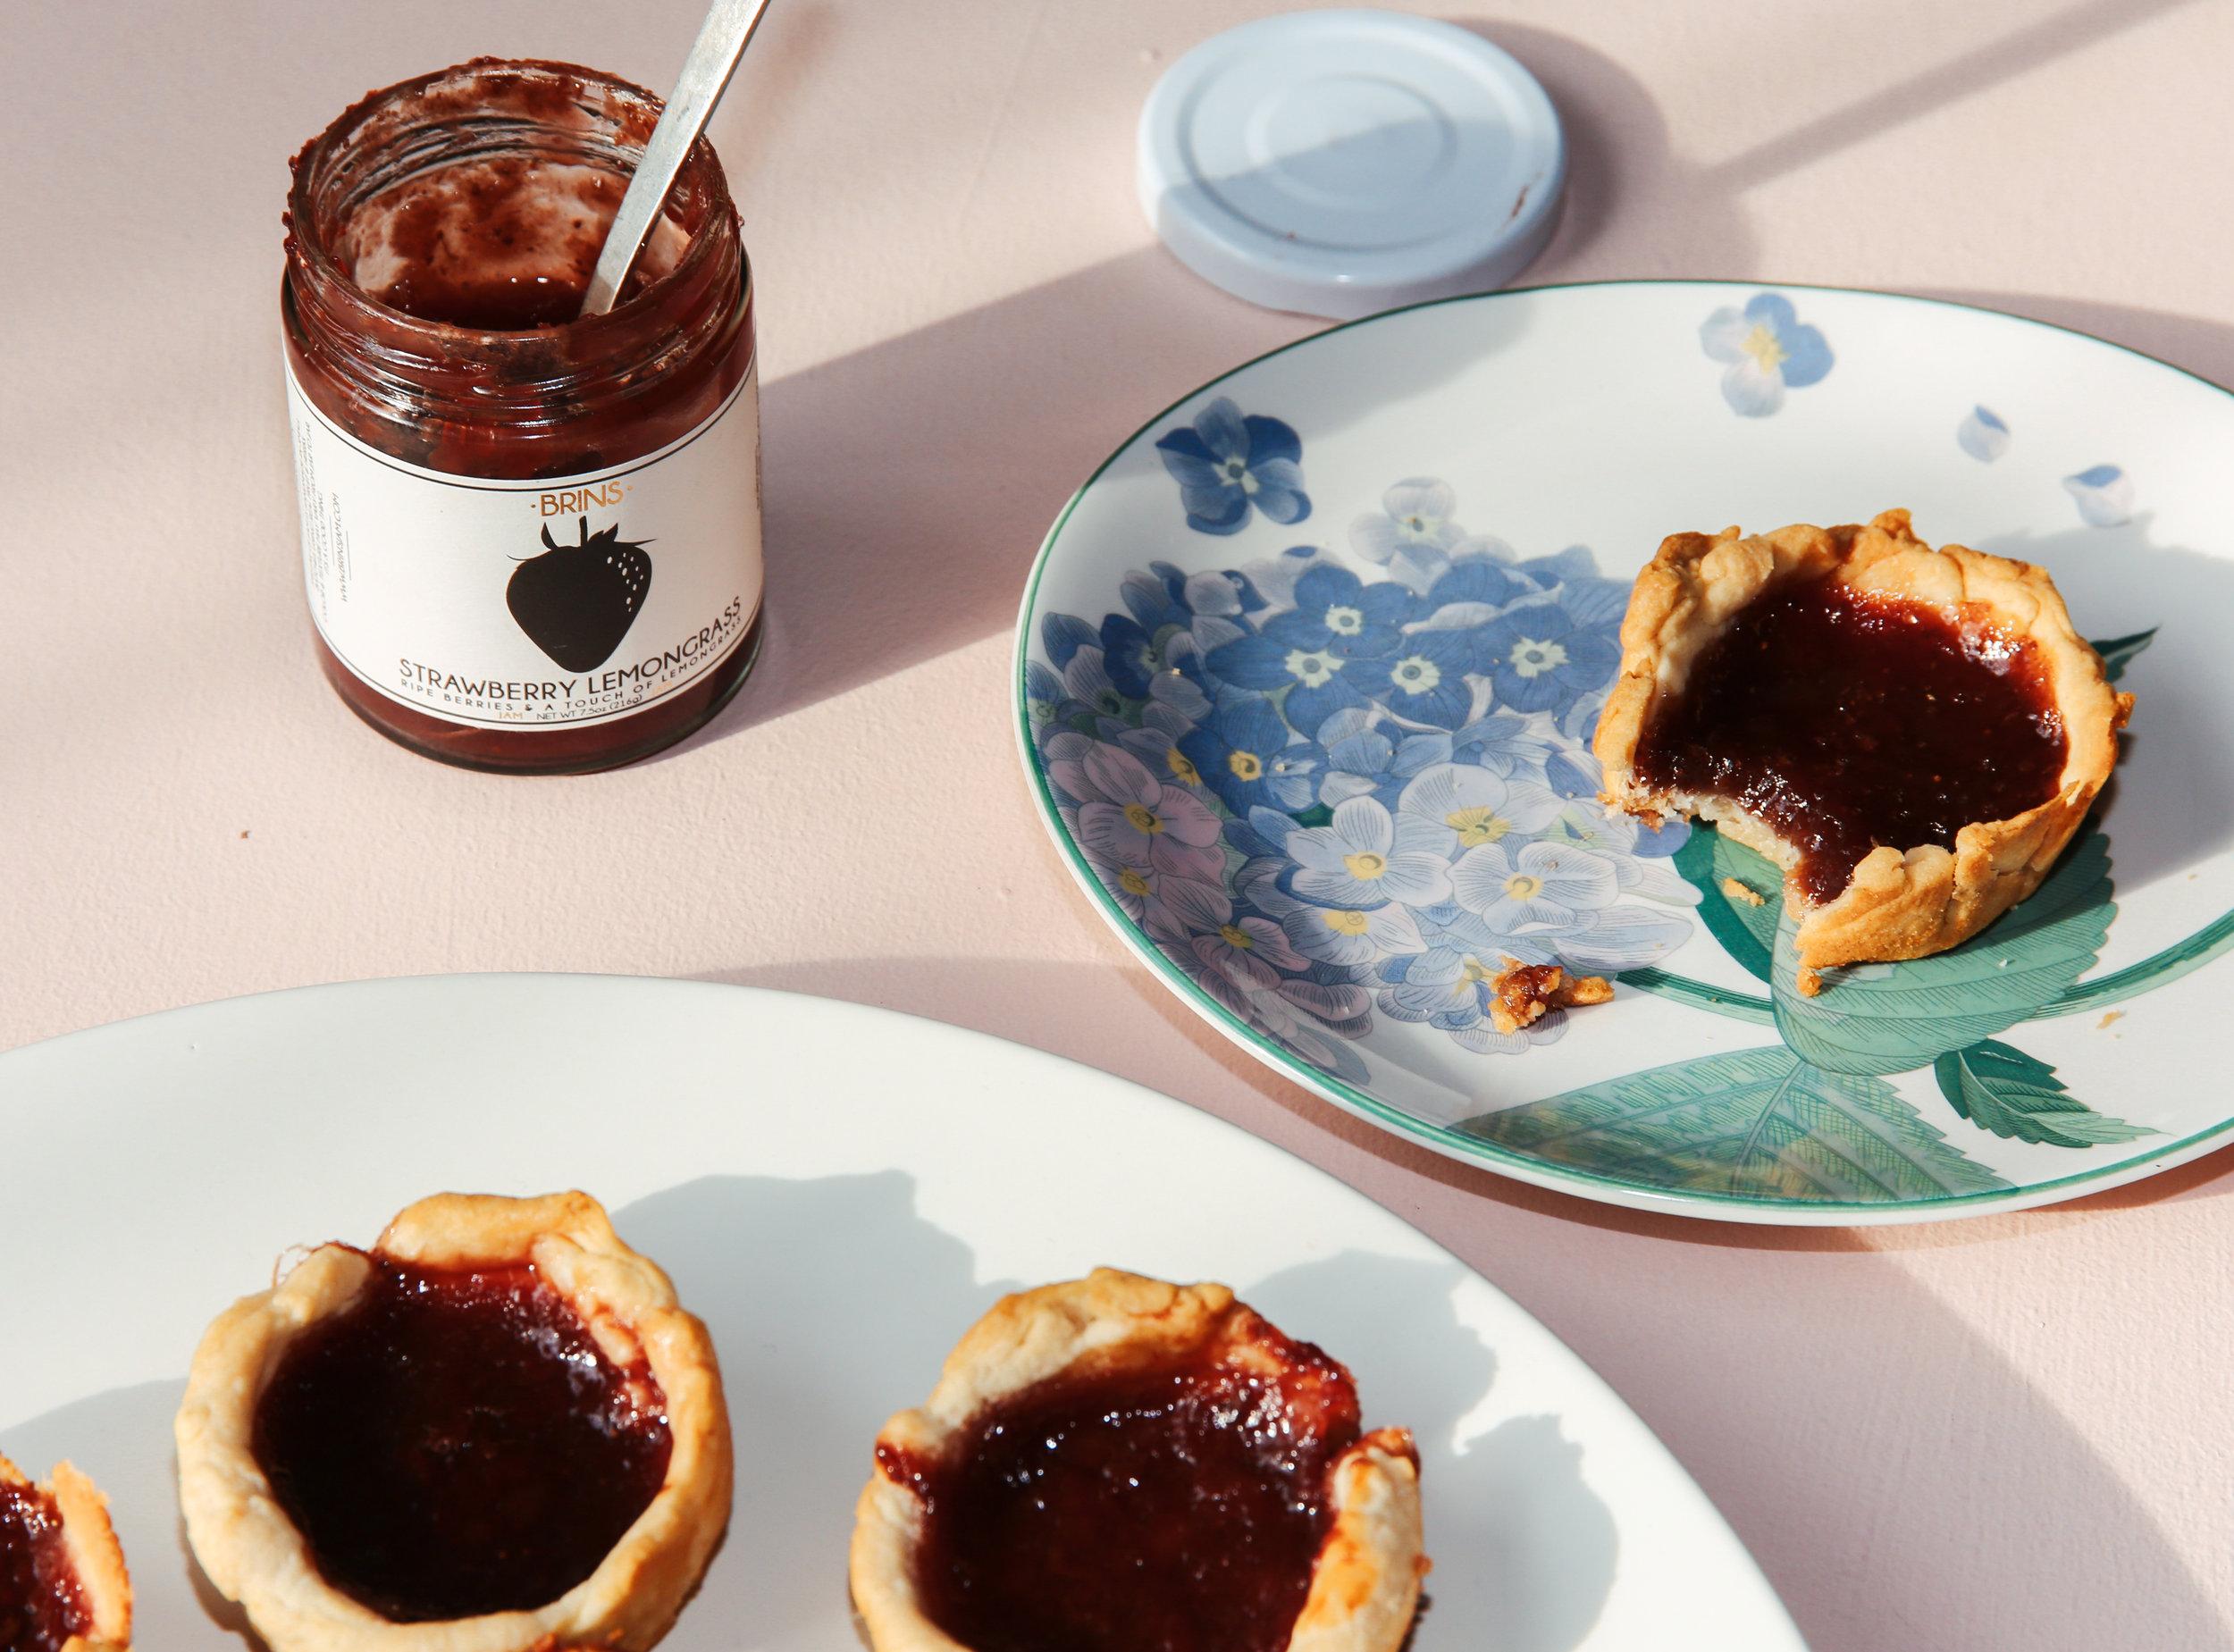 BRINS Strawberry Jam Tarts 3.jpg